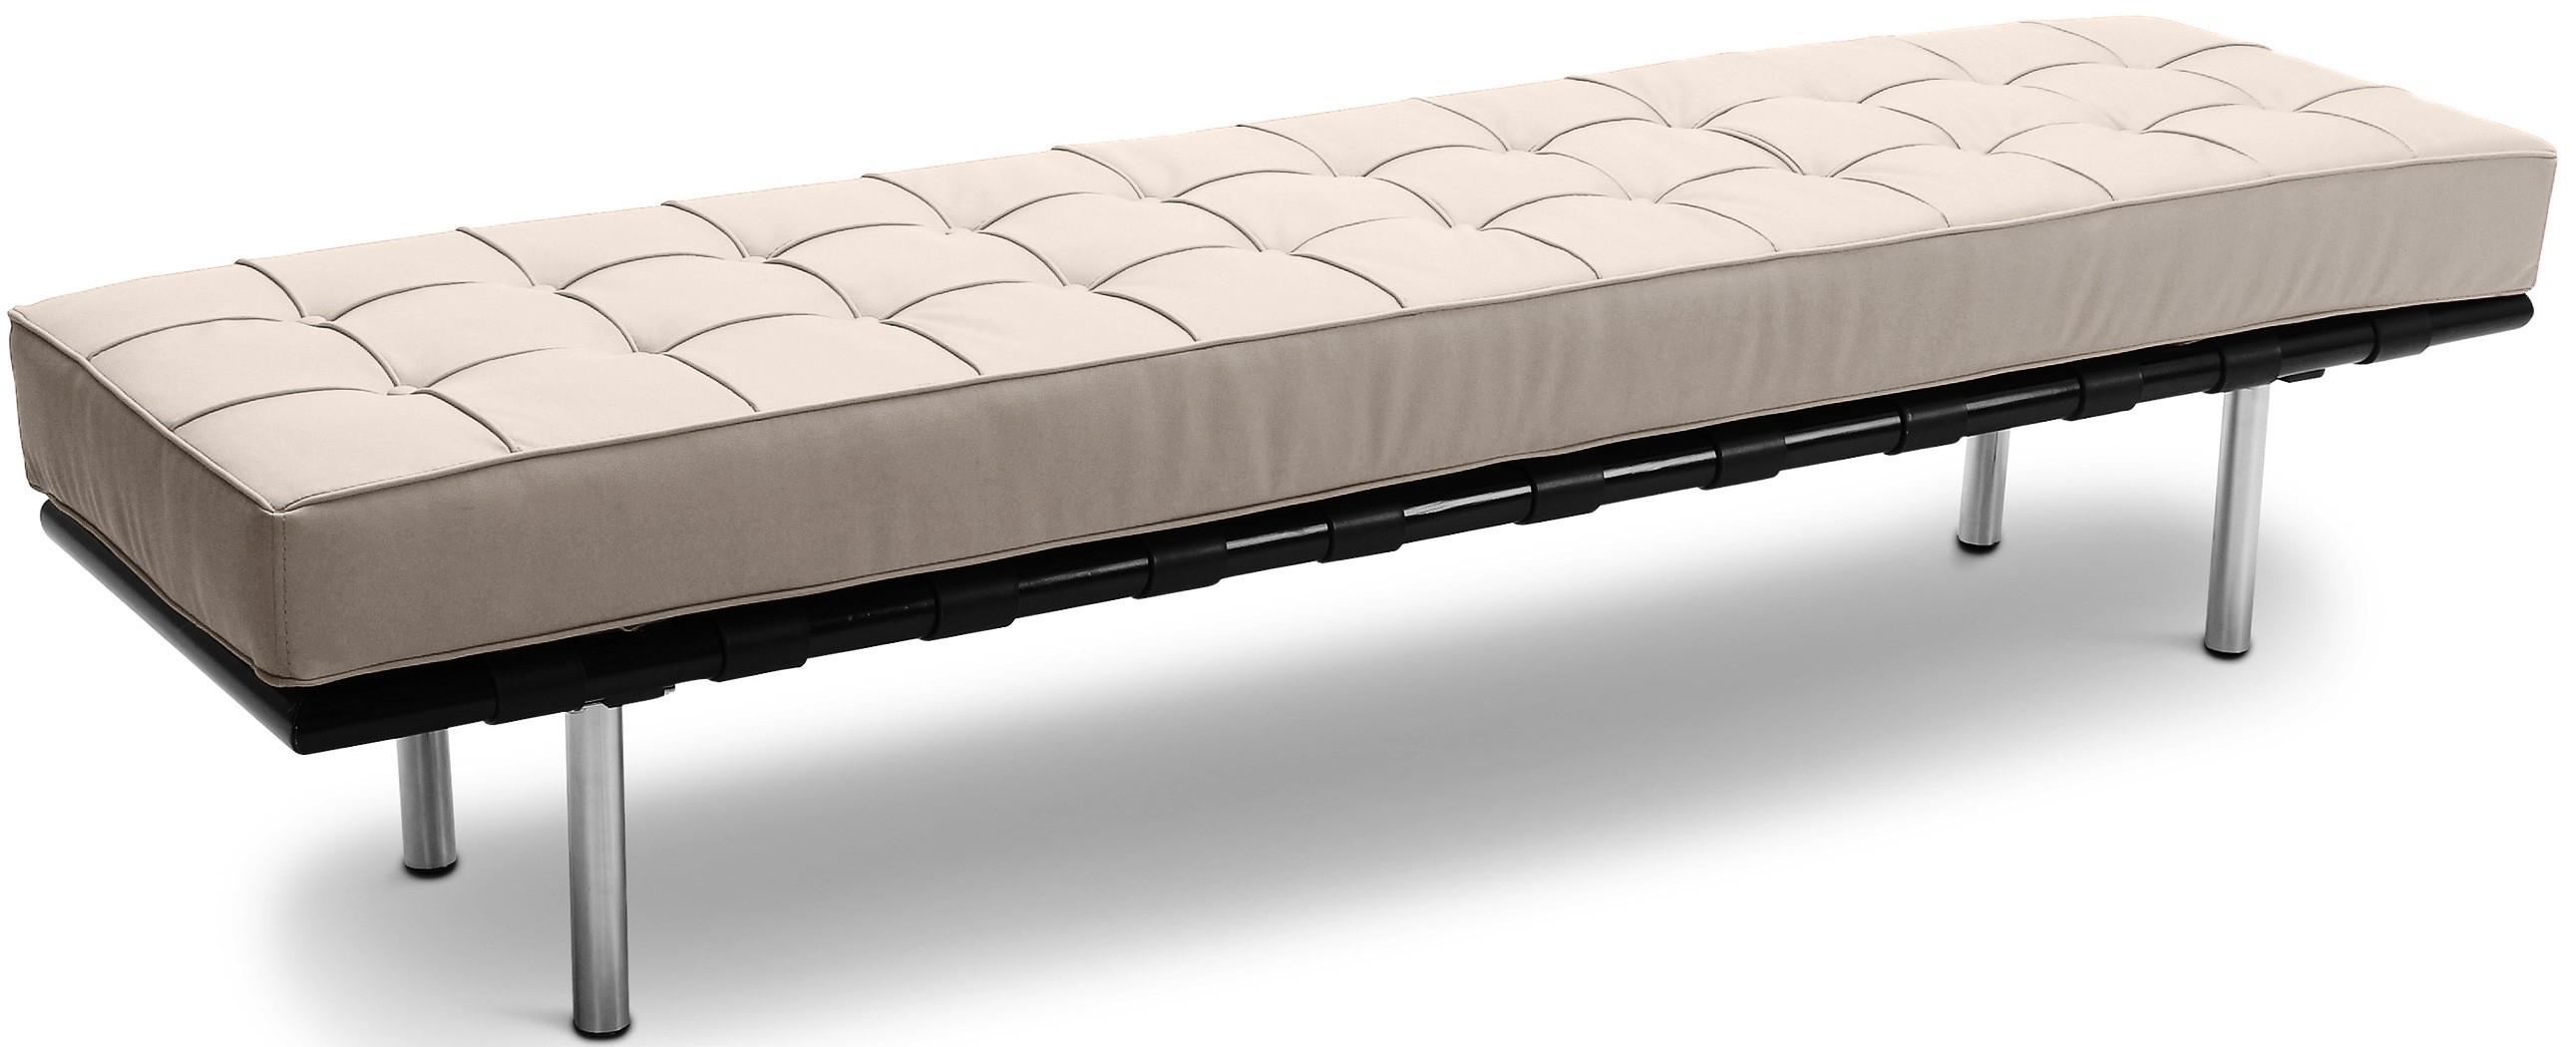 banc 3 places simili ivoire barca inspir ludwig mies van der rohe. Black Bedroom Furniture Sets. Home Design Ideas